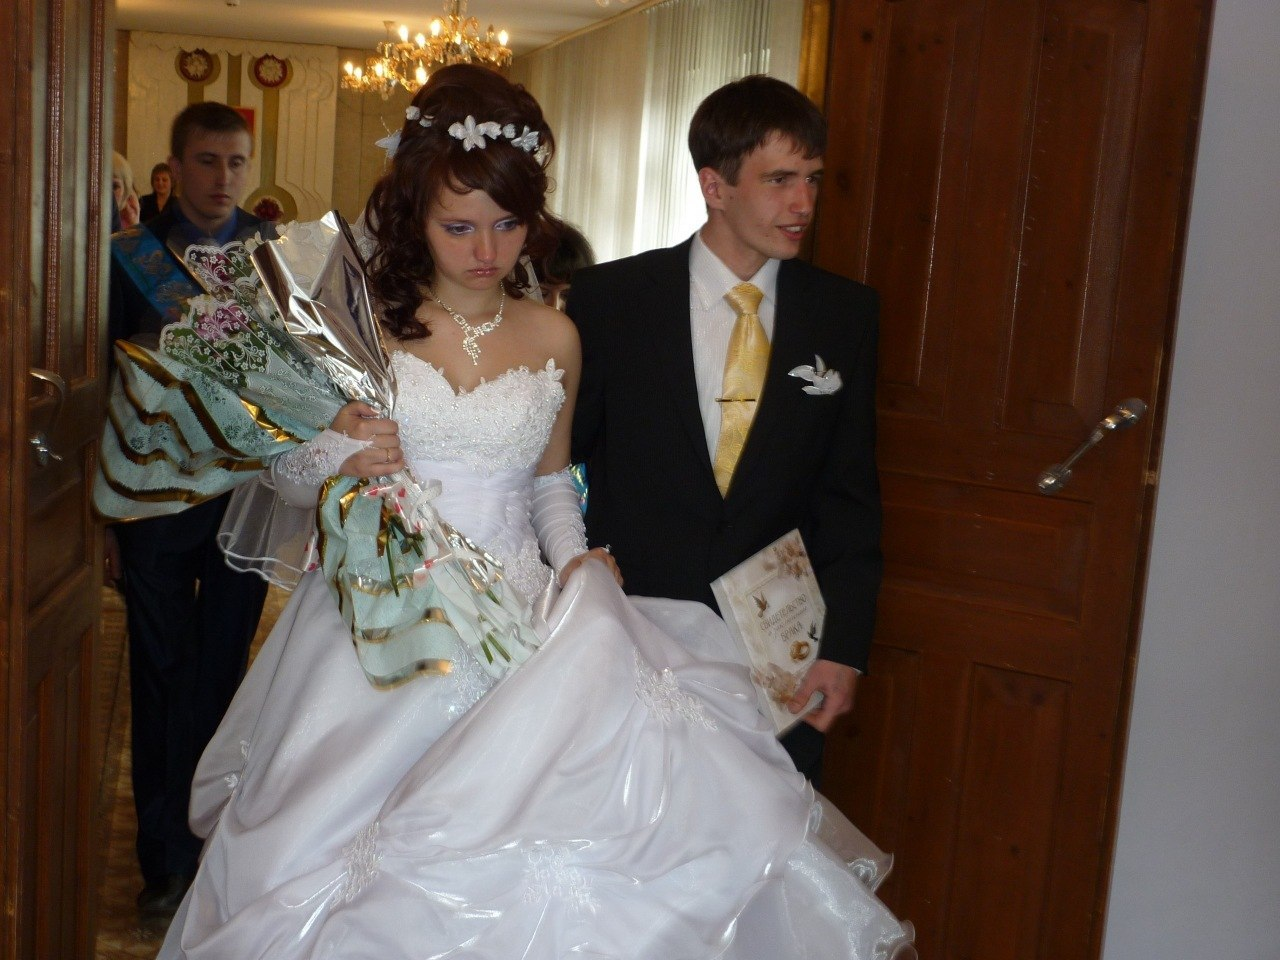 Фото невеста на свадьбе 19 фотография